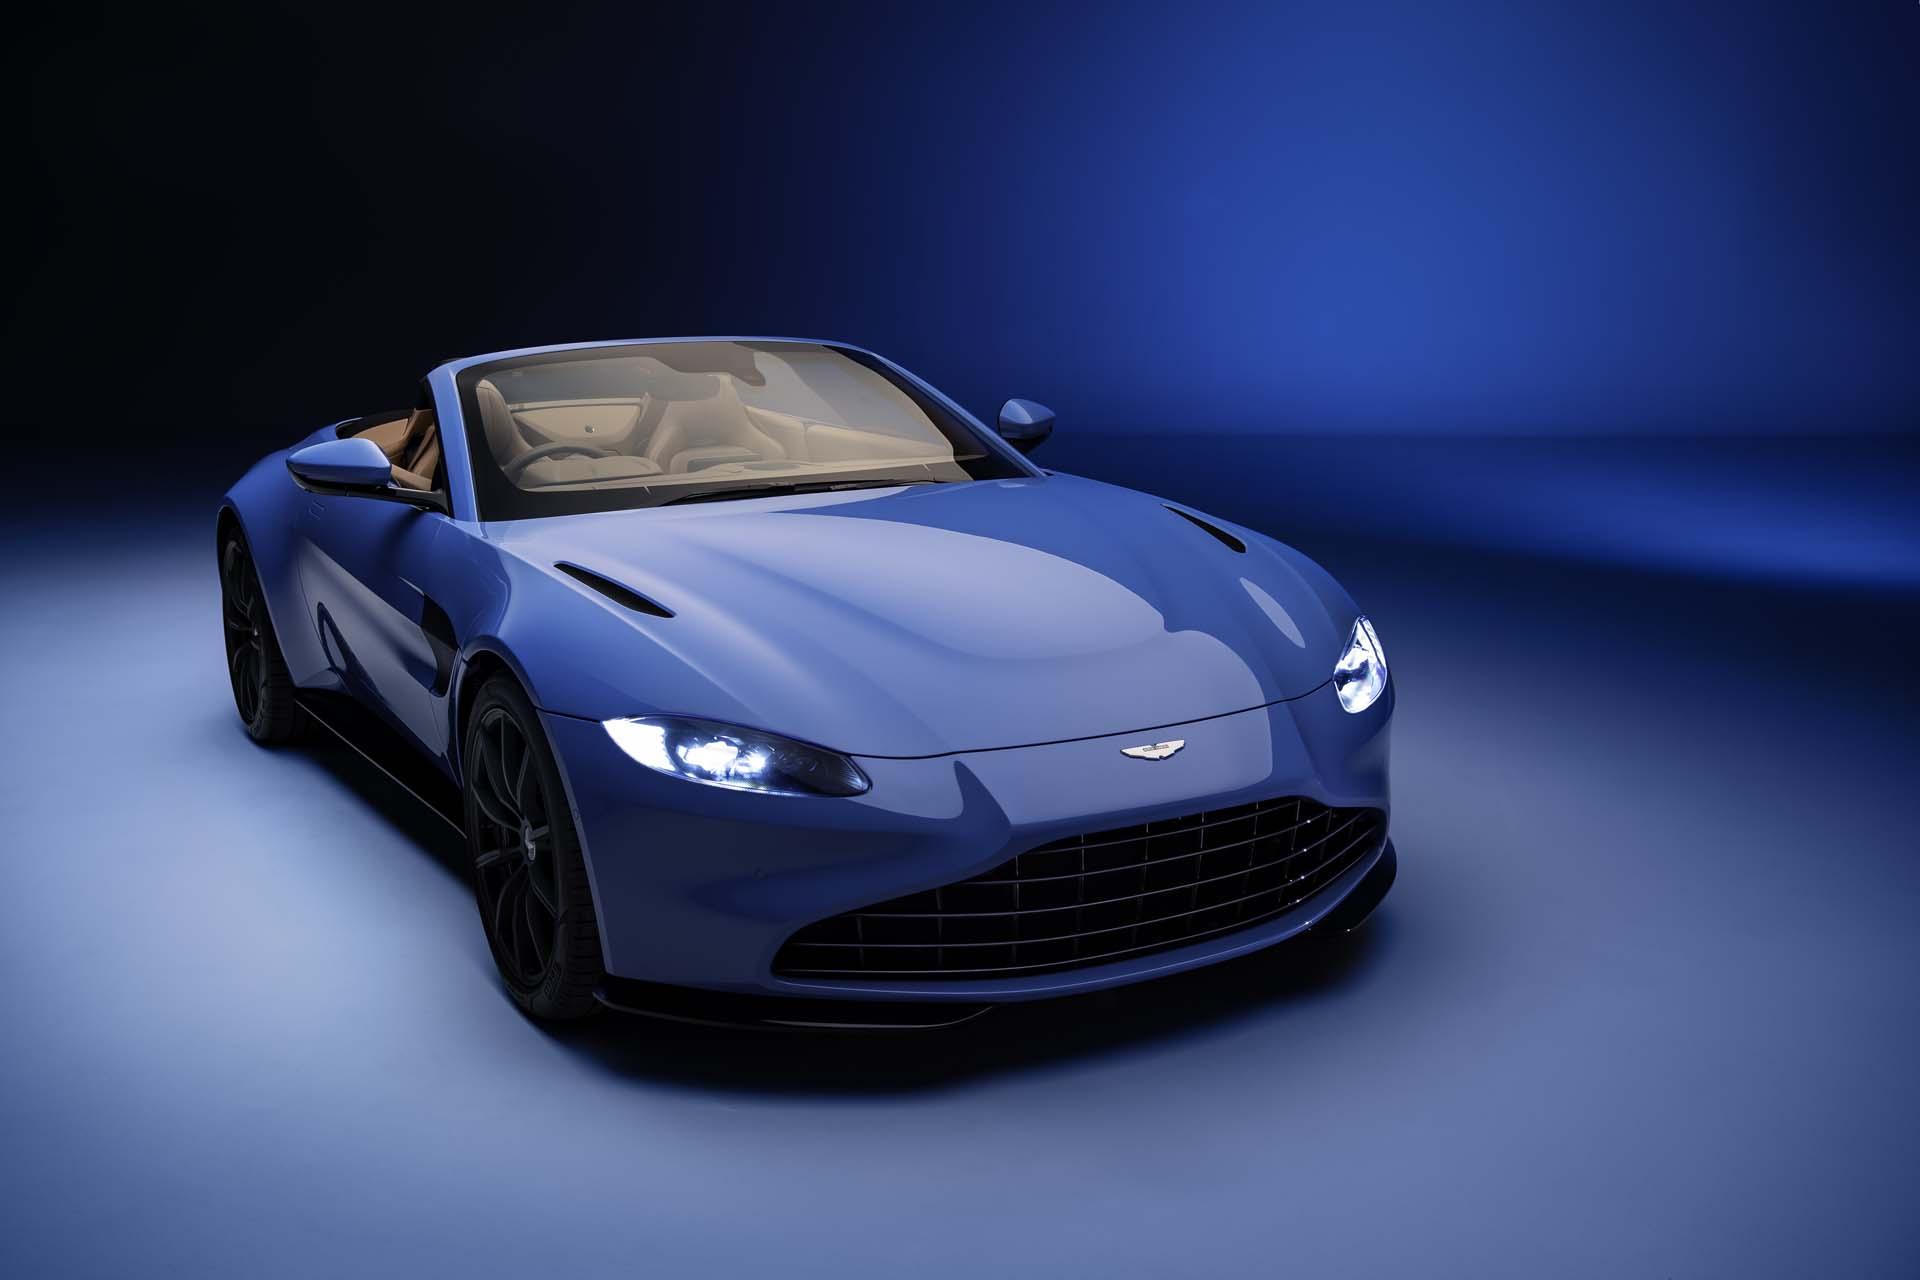 Aston Martin To Cut 500 Jobs